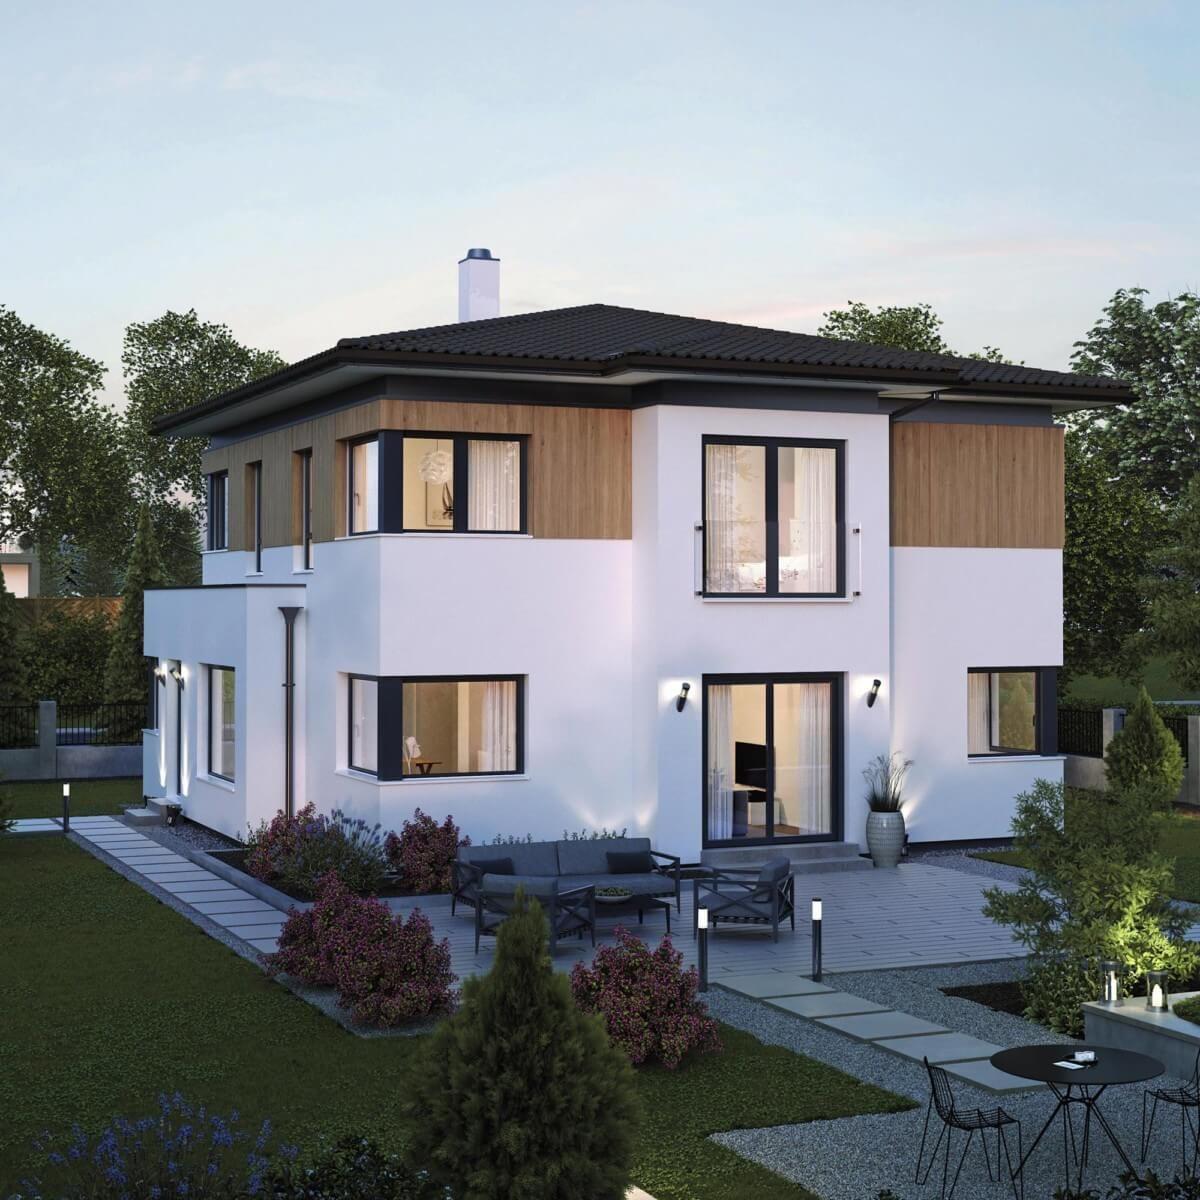 Stadtvilla Neubau modern mit Walmdach Architektur & Holz